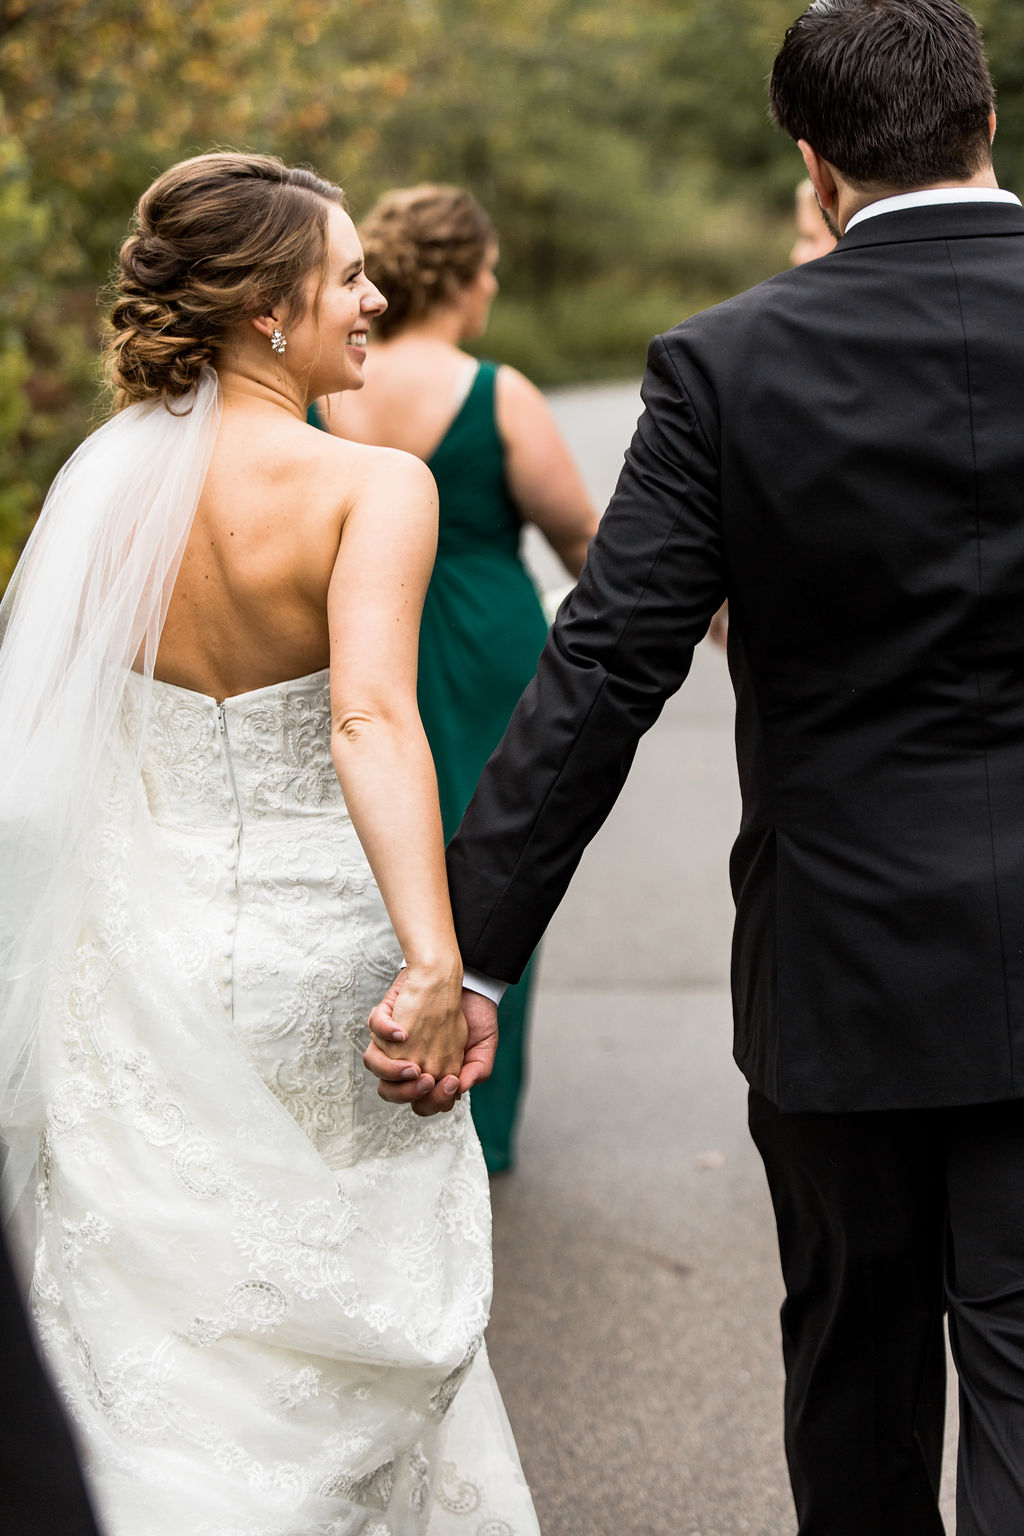 best_midwest_wedding_photographer_JMH_photography-45.jpg